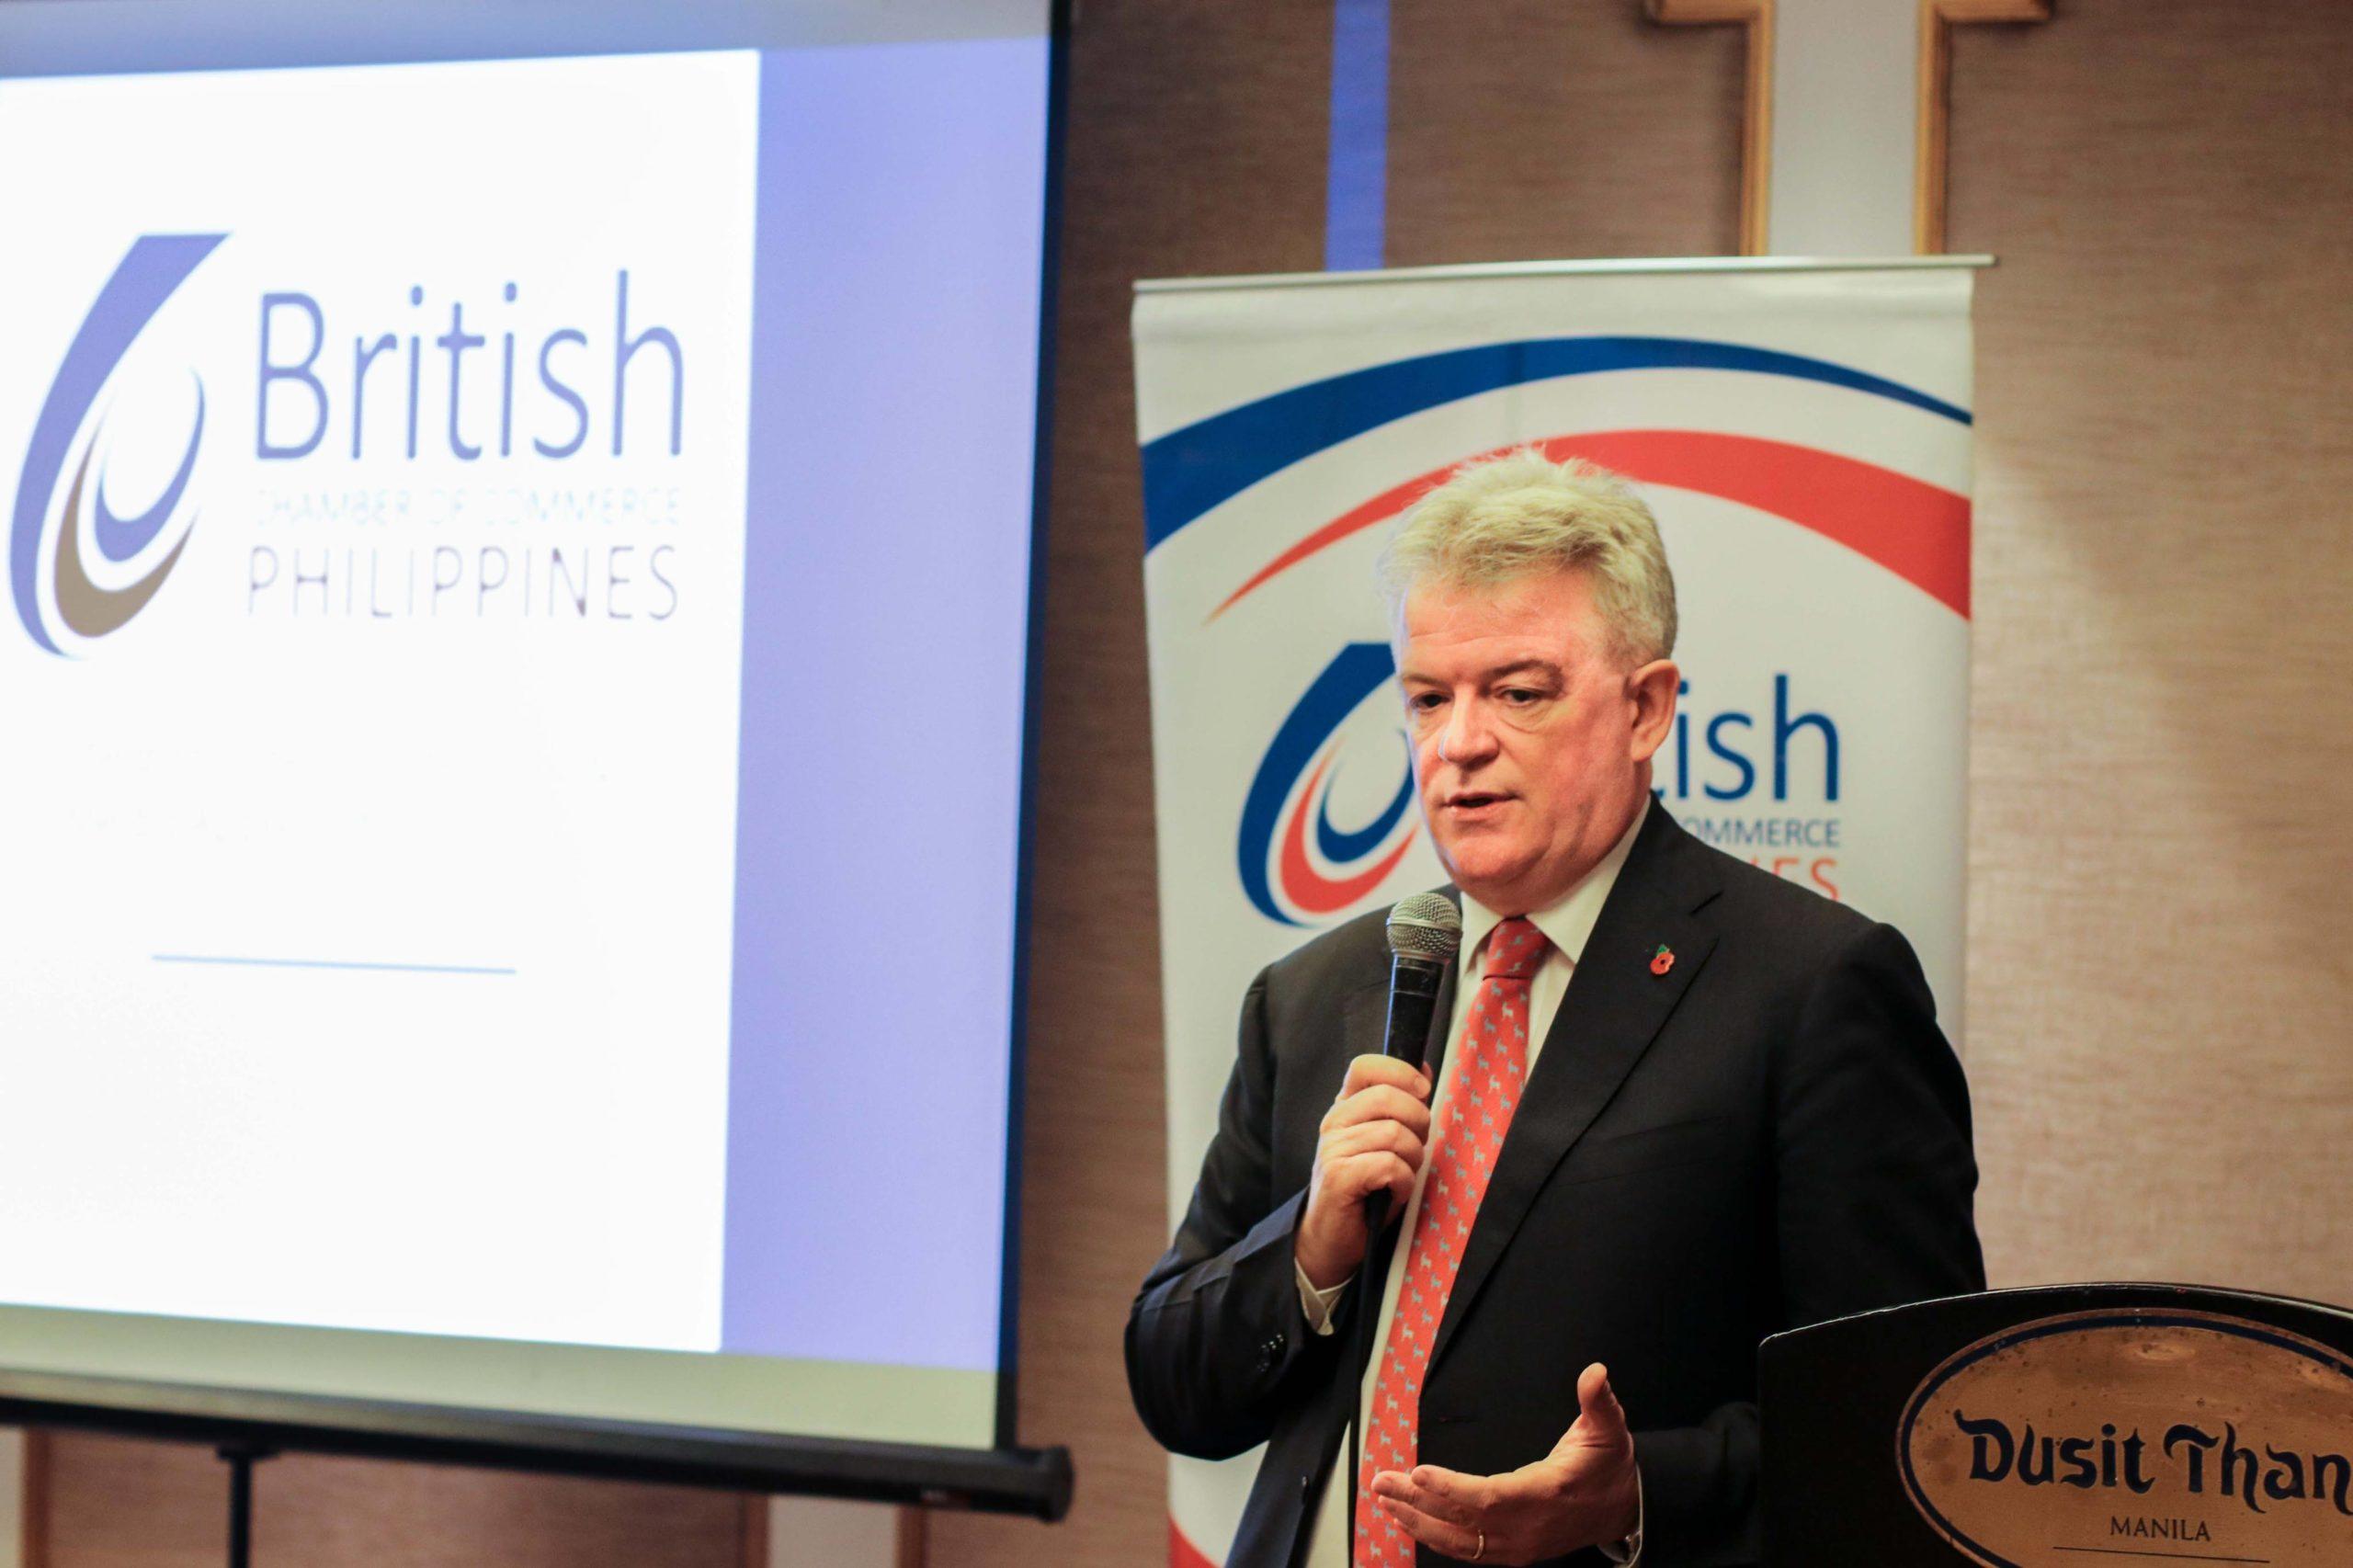 BCCP Chairman Chris Nelson: PH, UK must sustain economic growth momentum in 2019